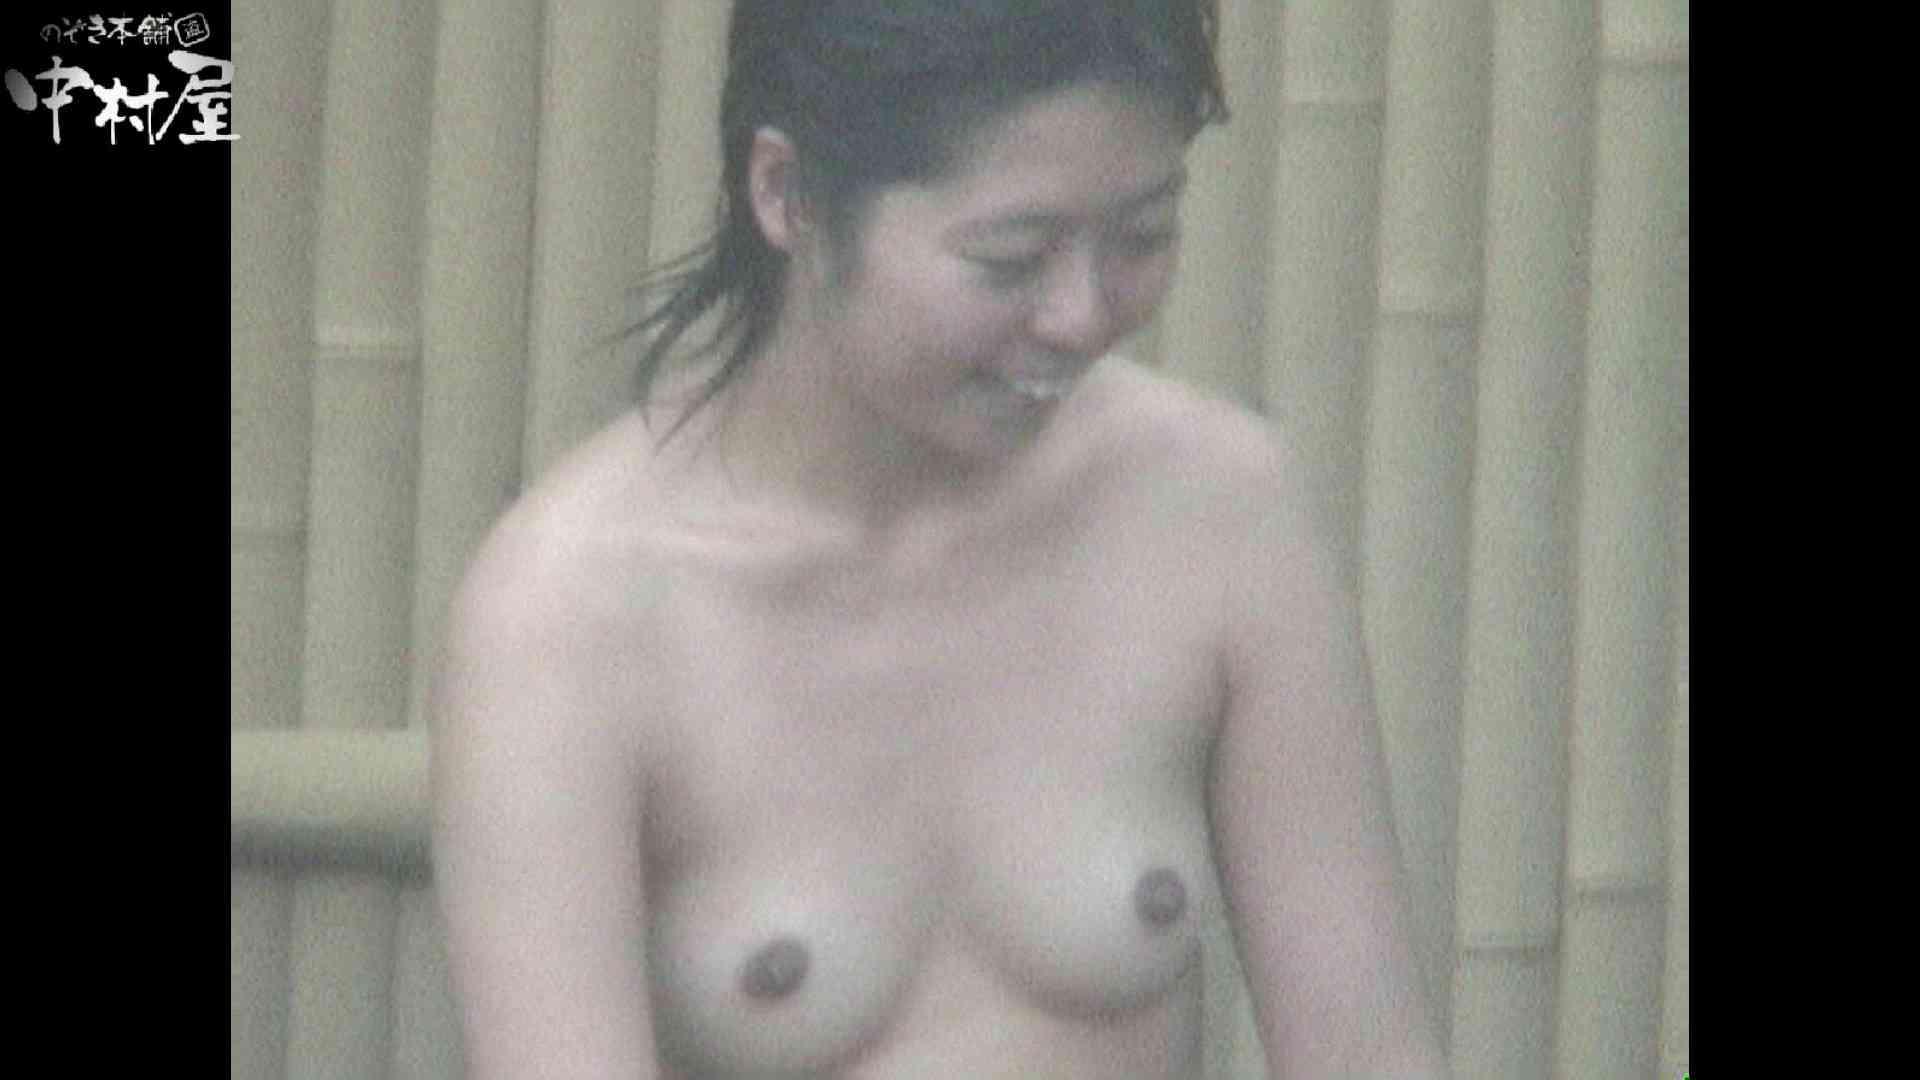 Aquaな露天風呂Vol.932 美しいOLの裸体 おまんこ無修正動画無料 106pic 8